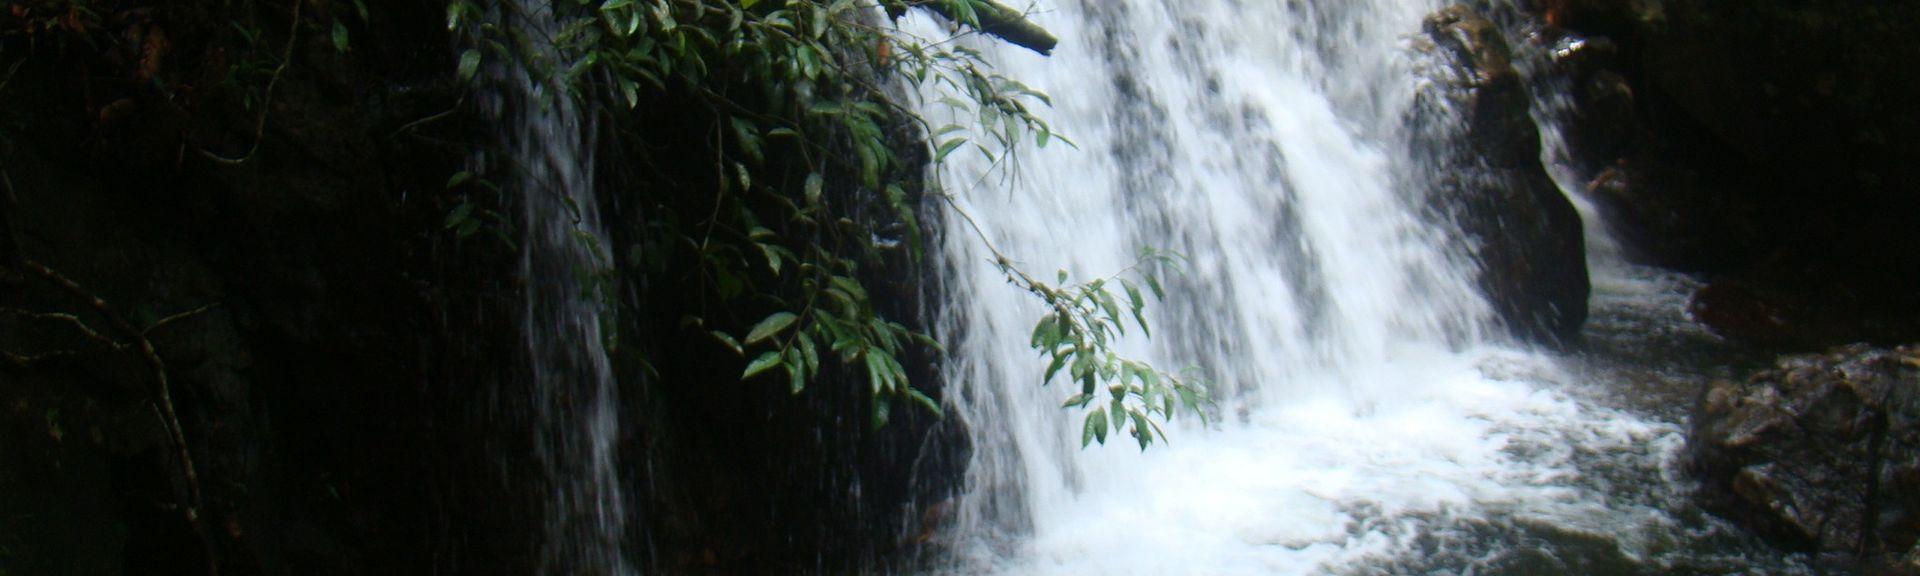 Phu Quoc National Park, Phu Quoc, Vietnam